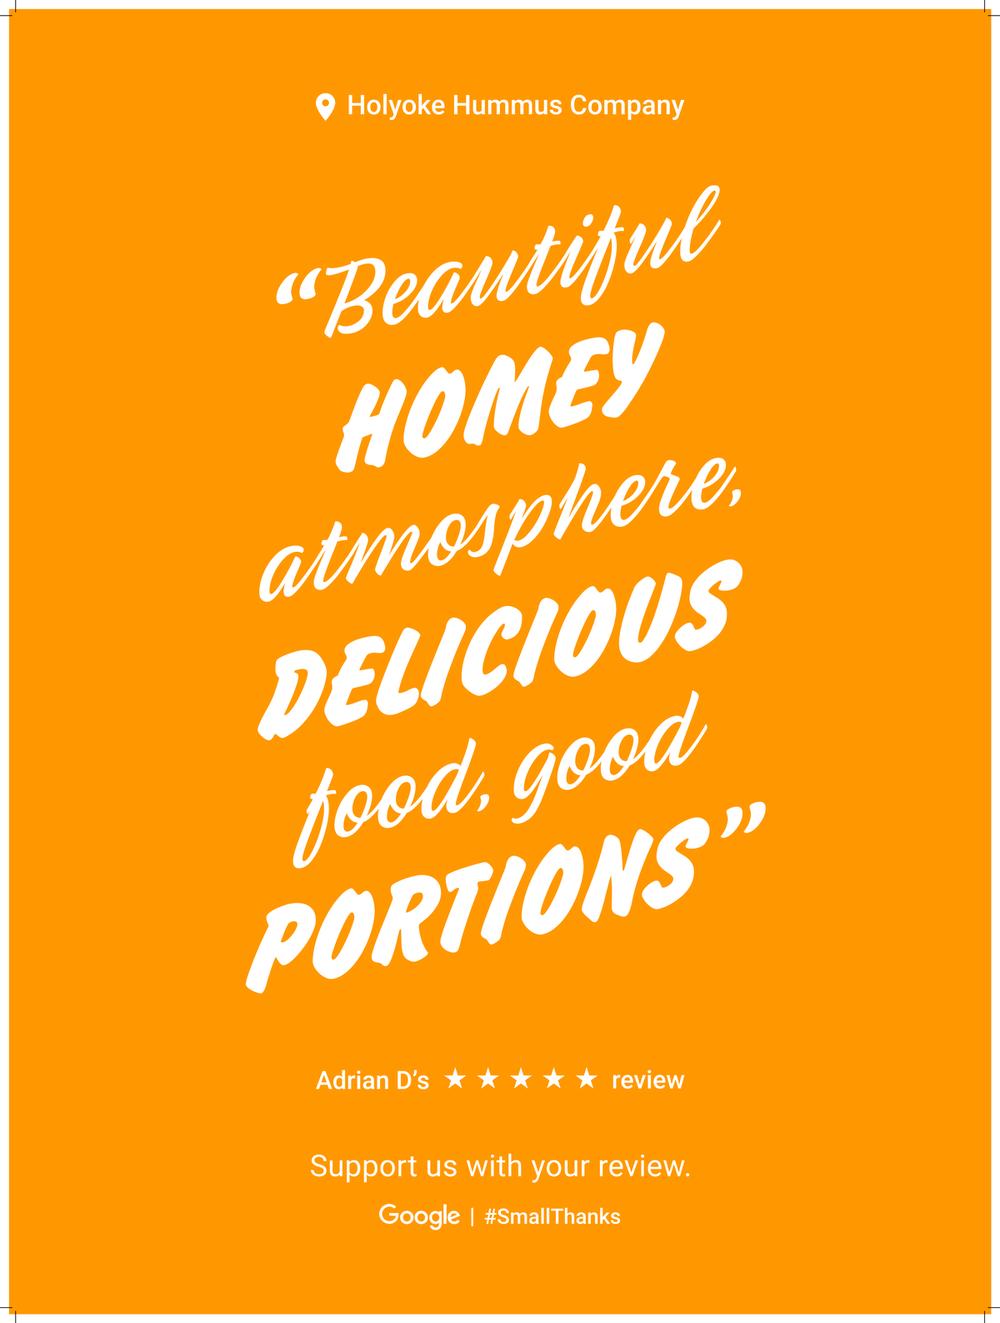 holyoke-hummus-company.png